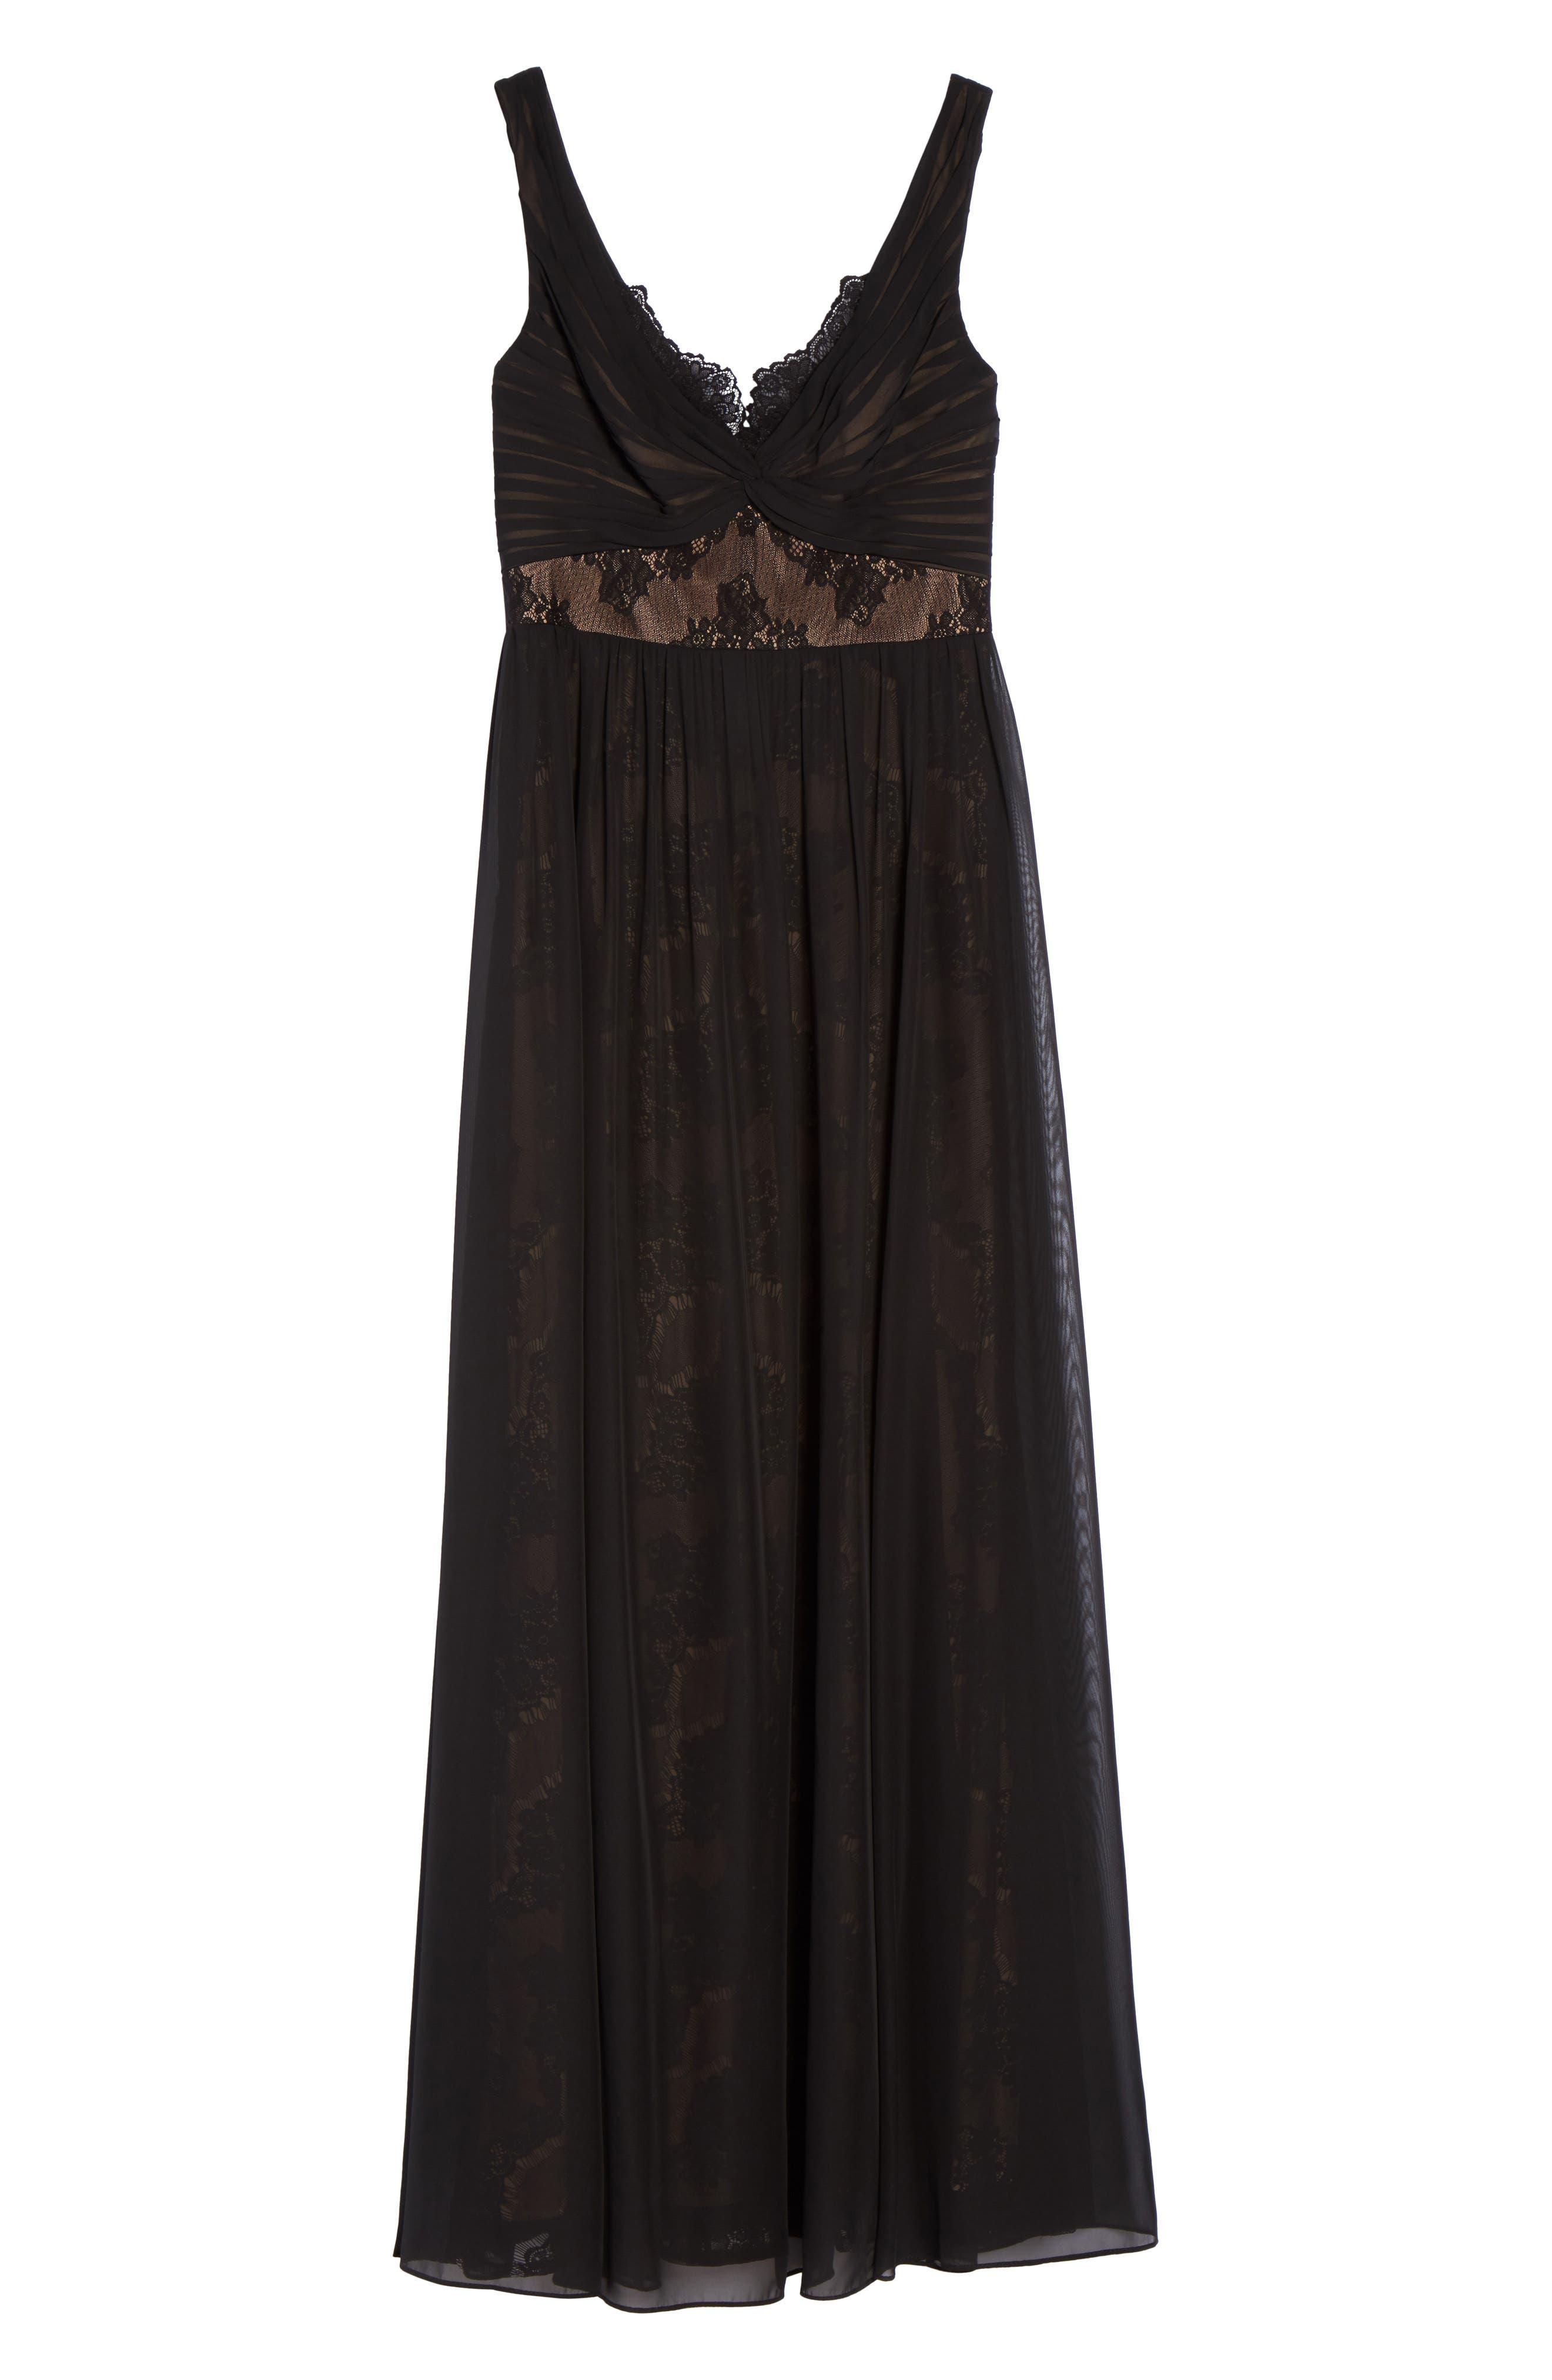 Lace Detail Gown,                             Alternate thumbnail 6, color,                             Black Nude